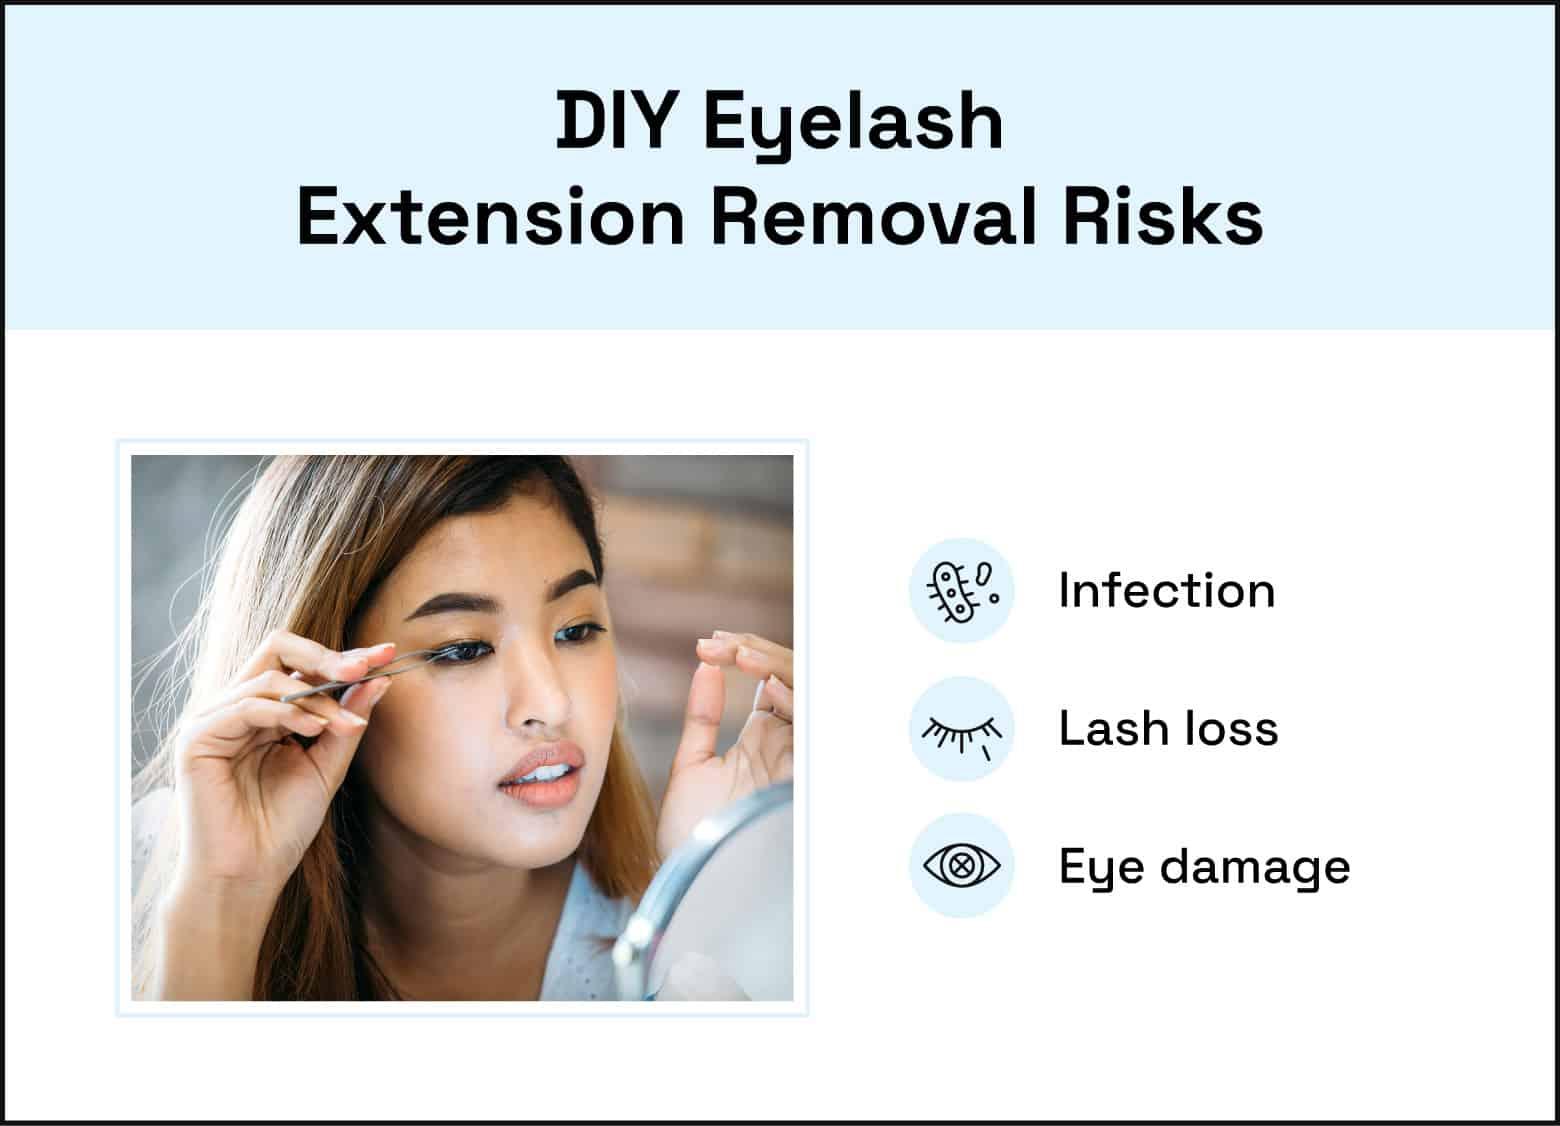 diy eyelash extension removal risks infection lash loss eye damage